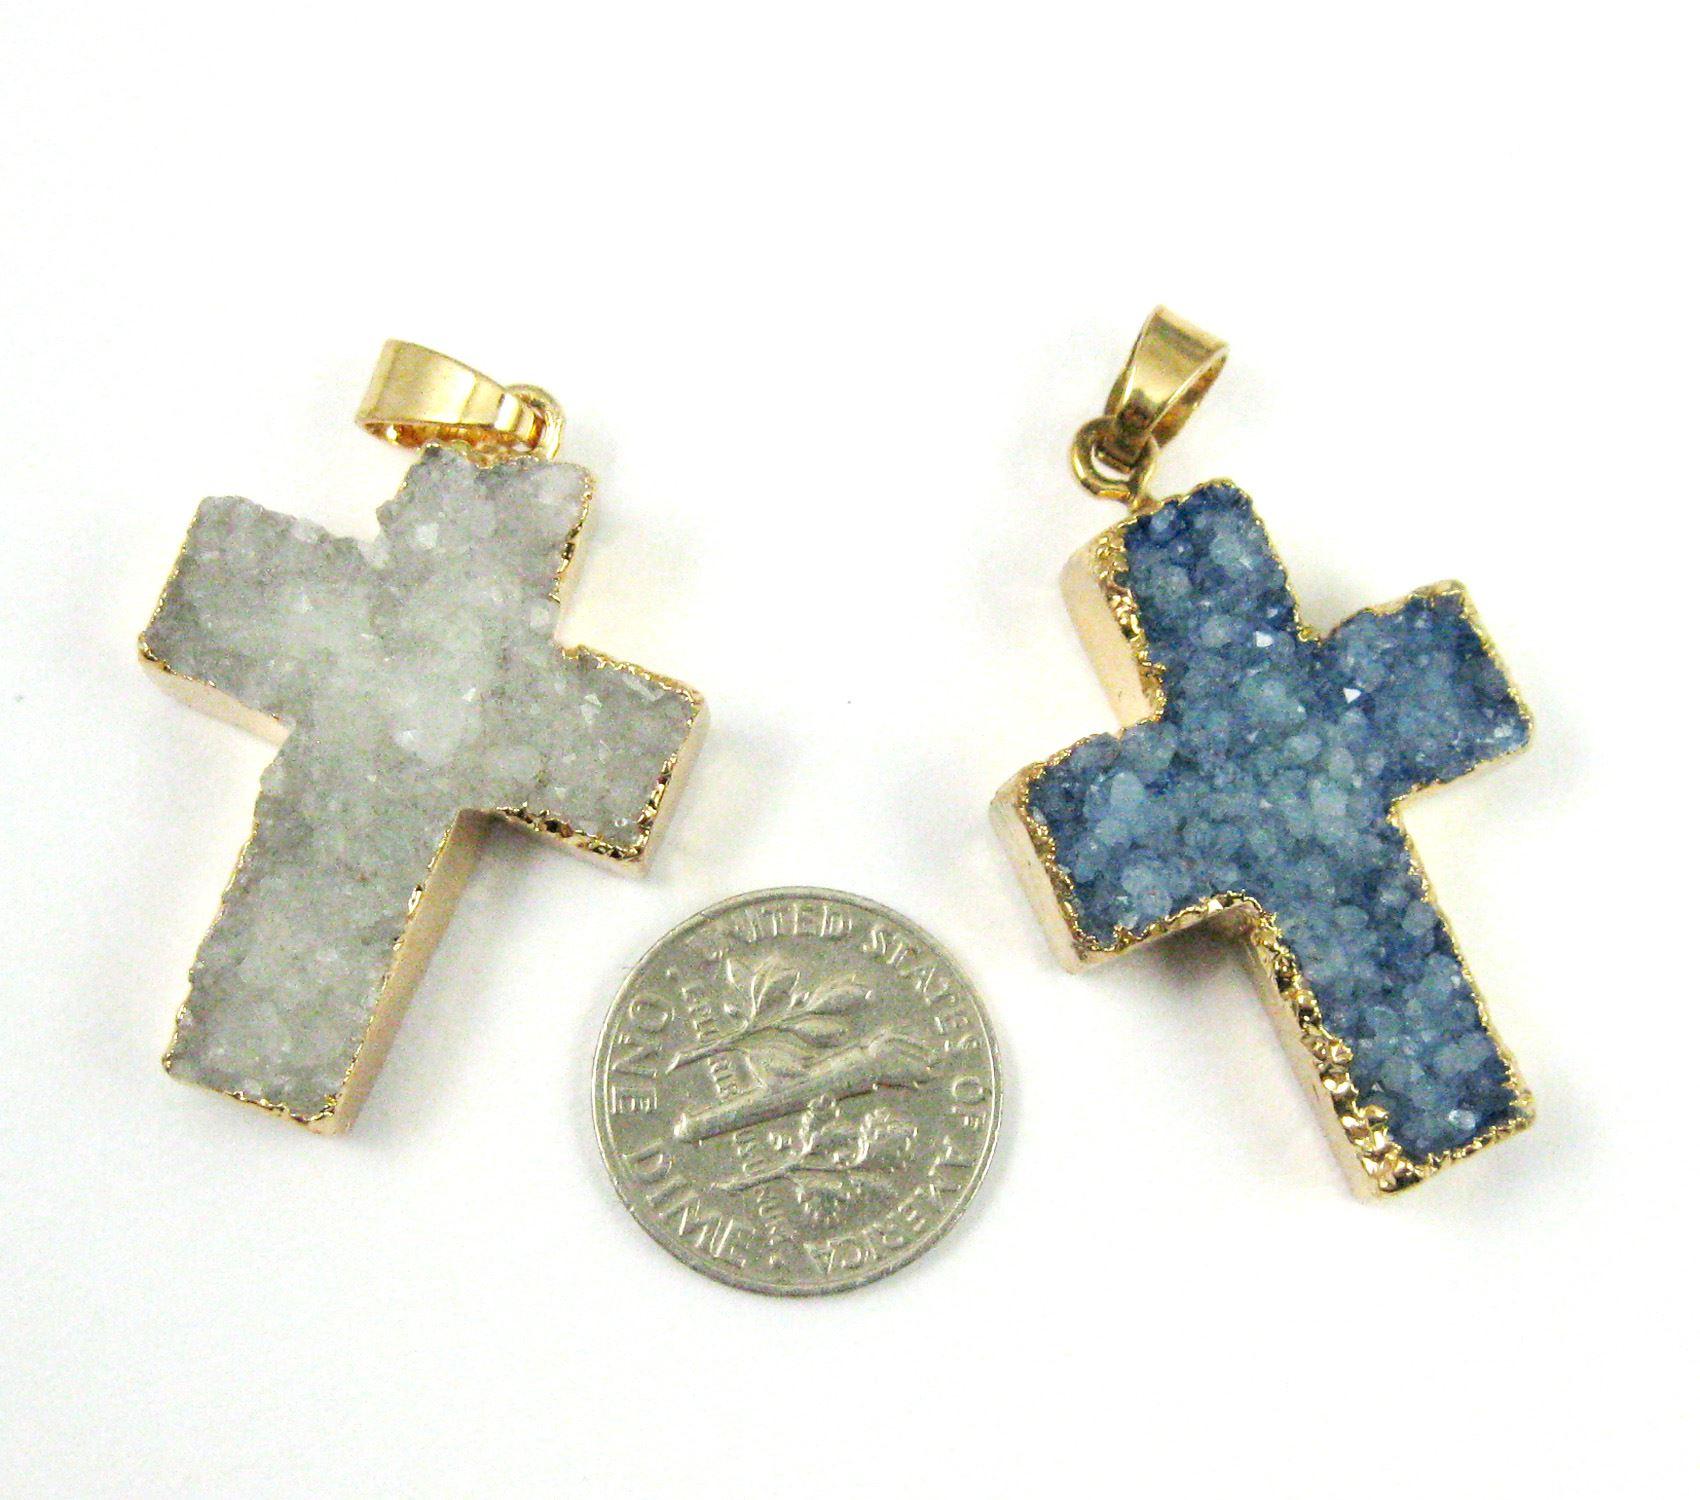 Natural Agate Druzy Pendant, Purple Druzy Cross ,Agate Gold Edging, Large Druzy Small Cross Pendant- 30mm